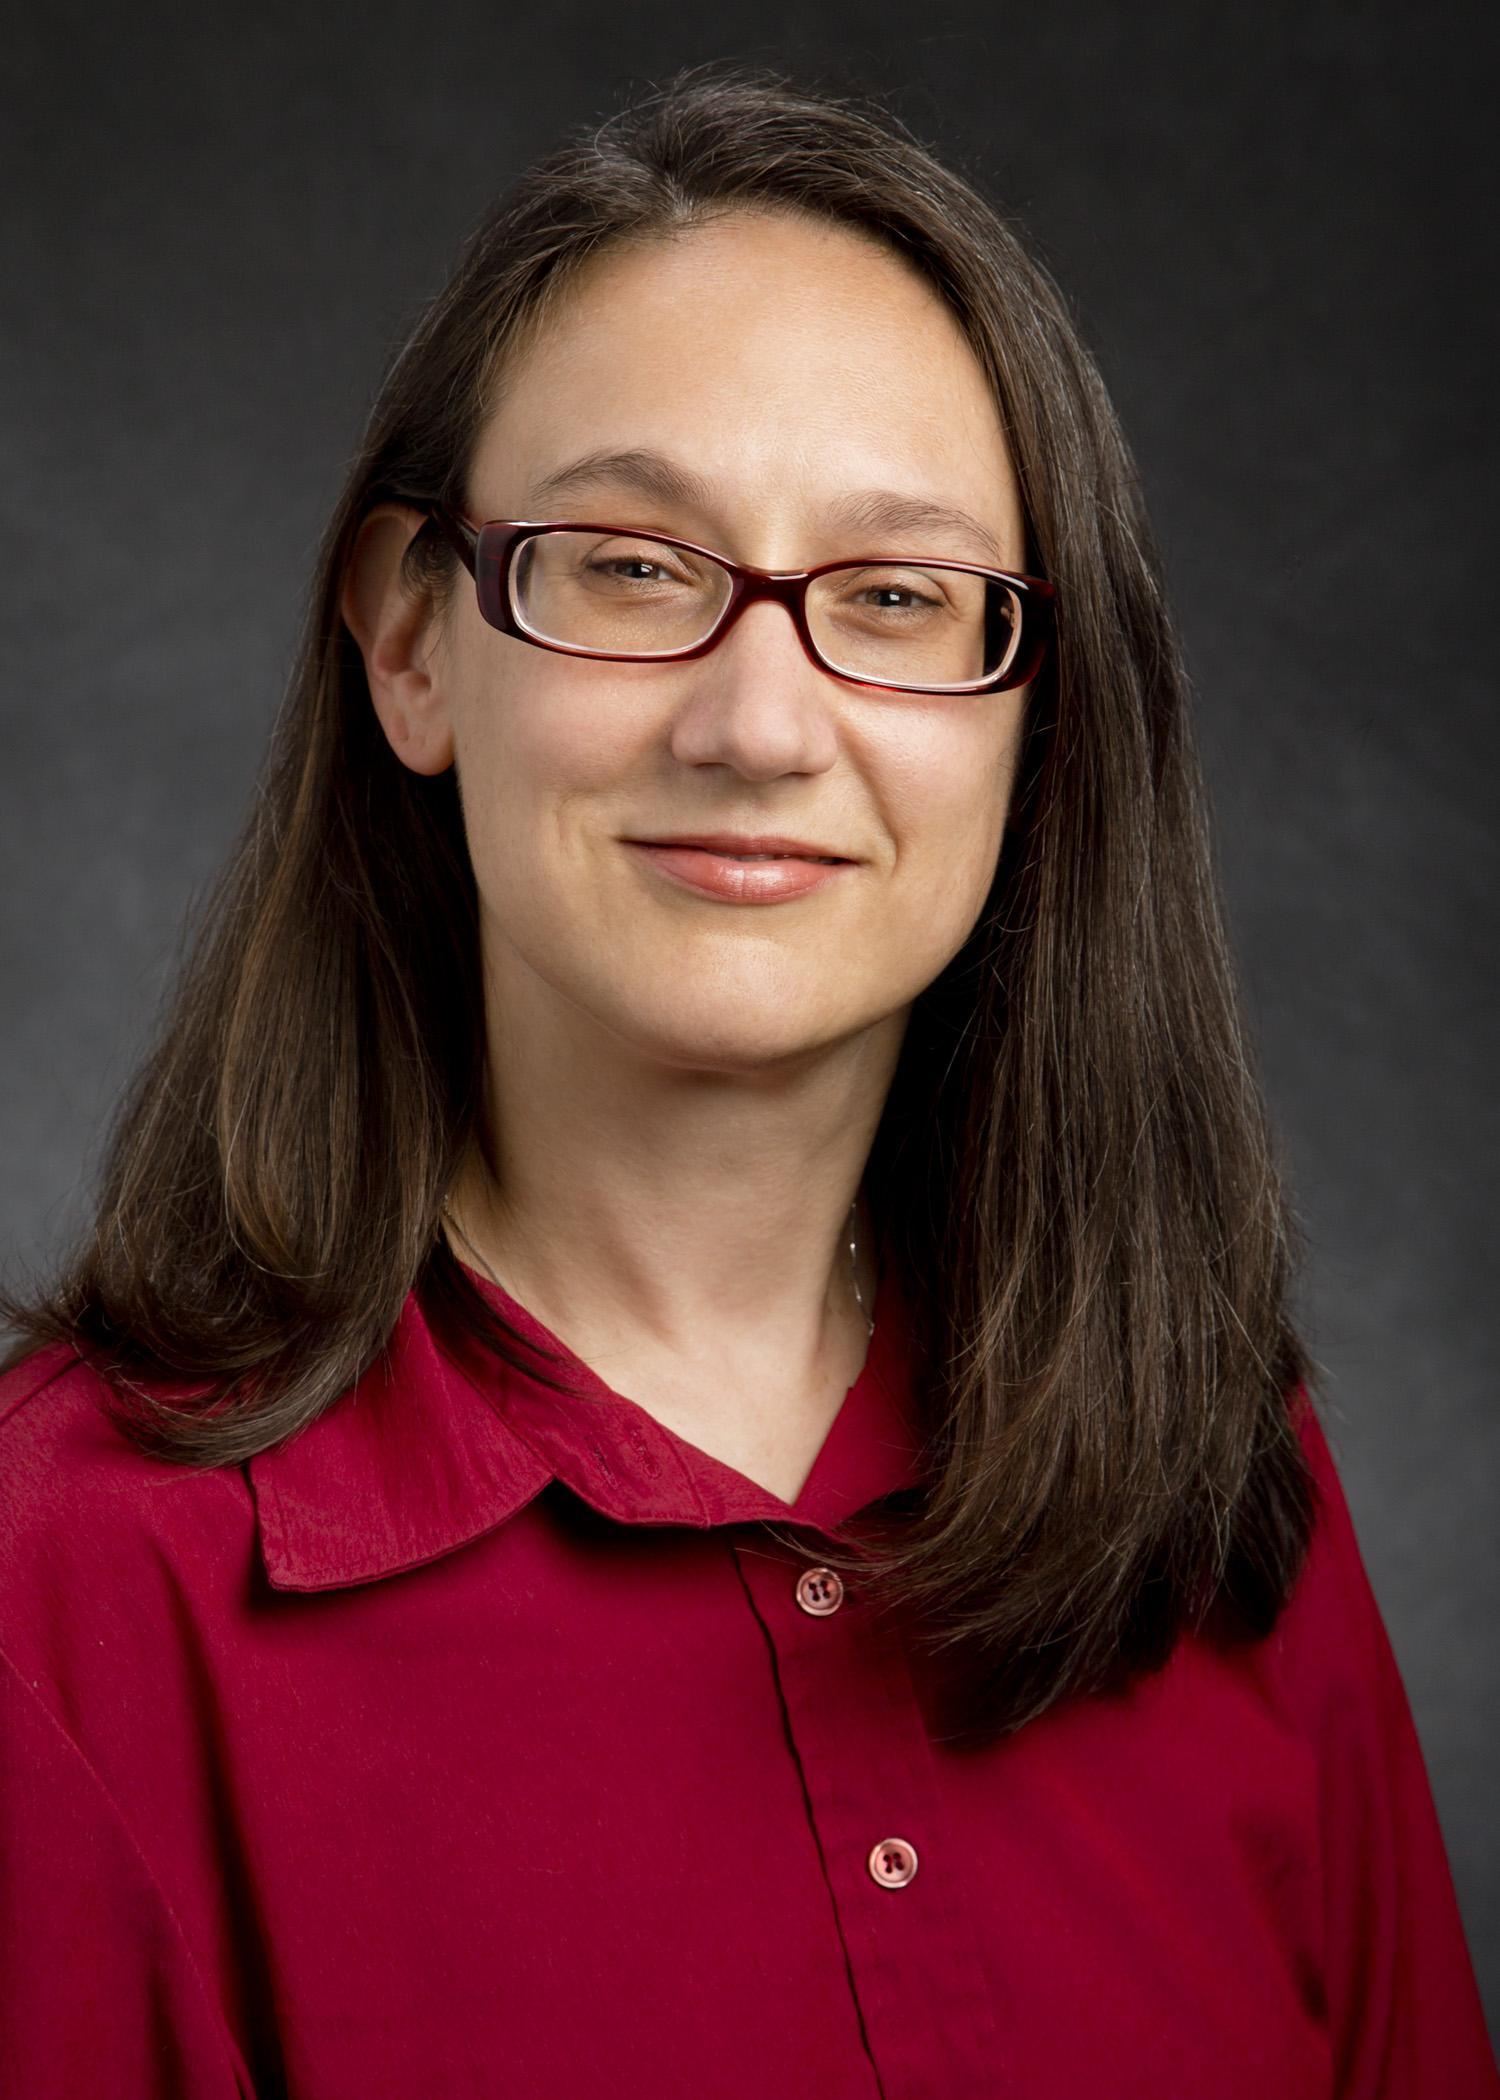 Image of Dr. Anita Hund wearing glasses and smiling.